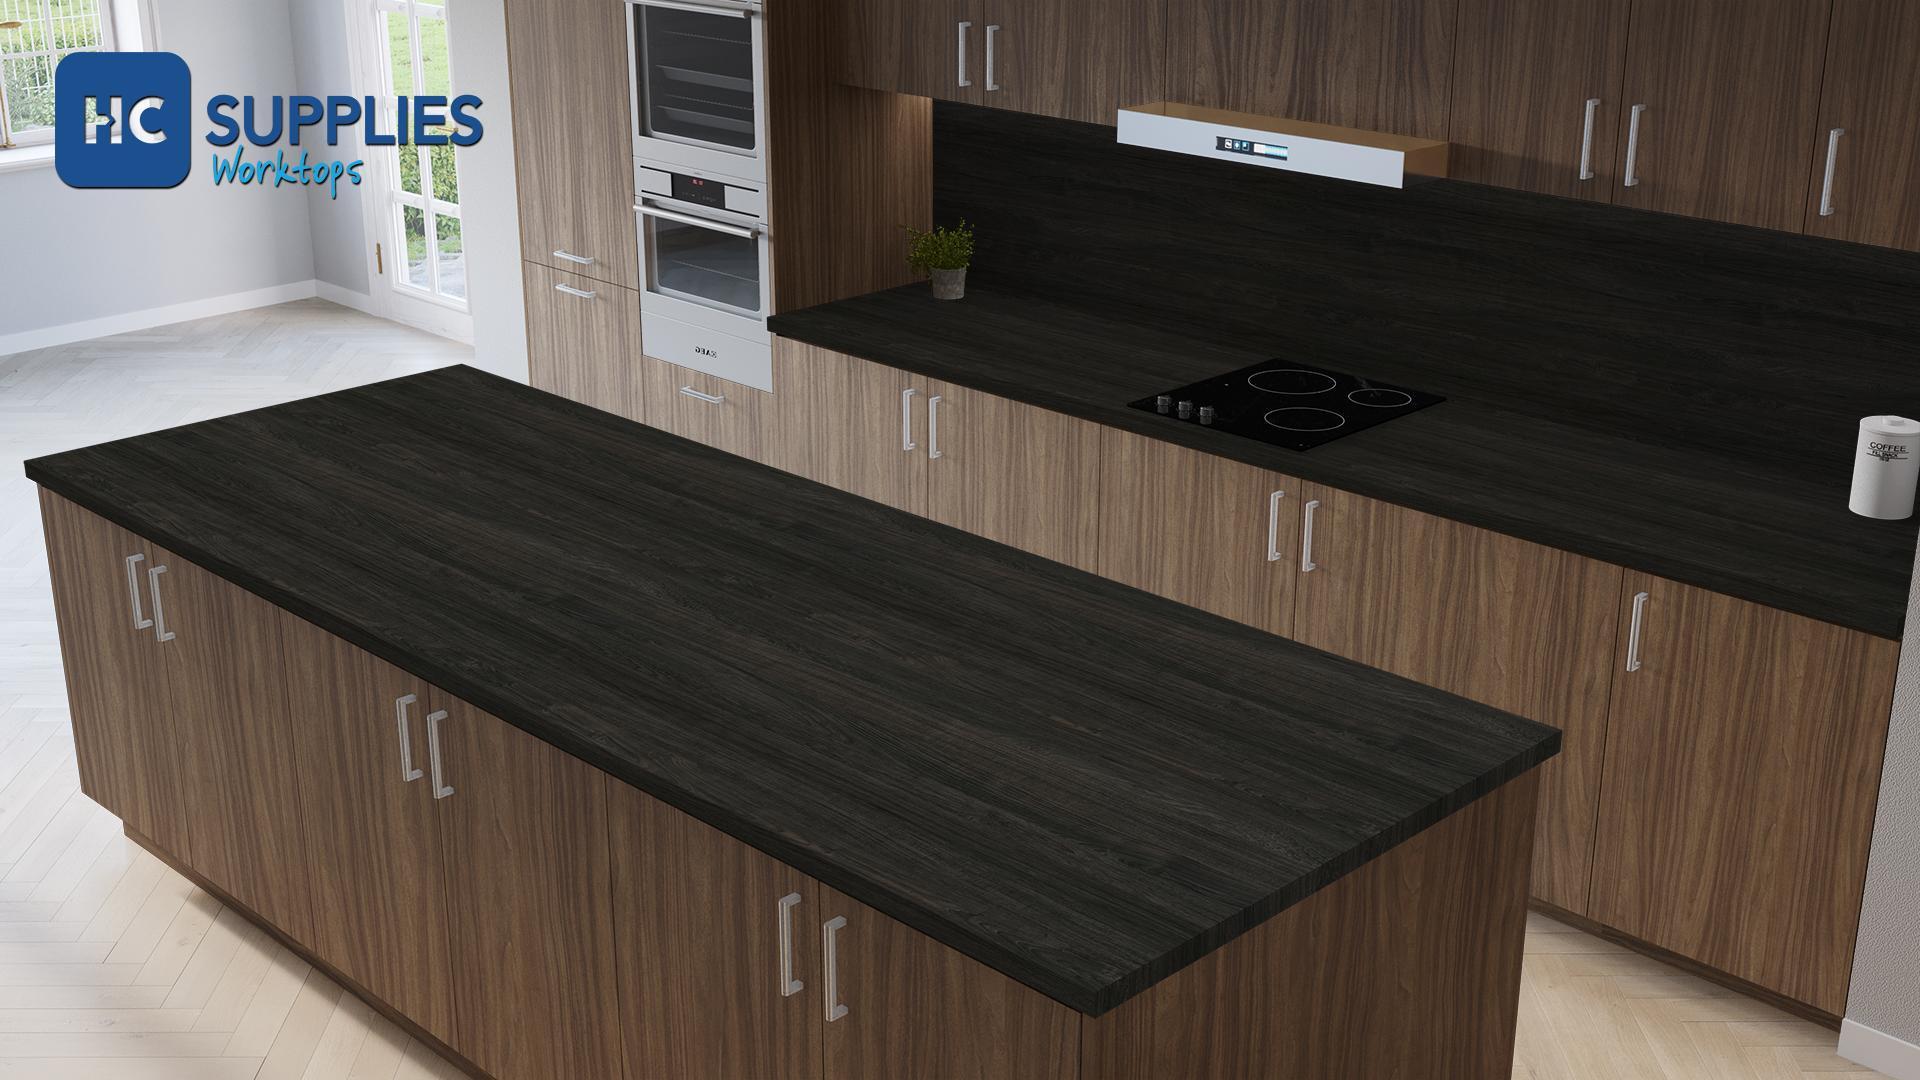 4m Worktops Direct 4 Metre Kitchen Worktops At Trade Prices